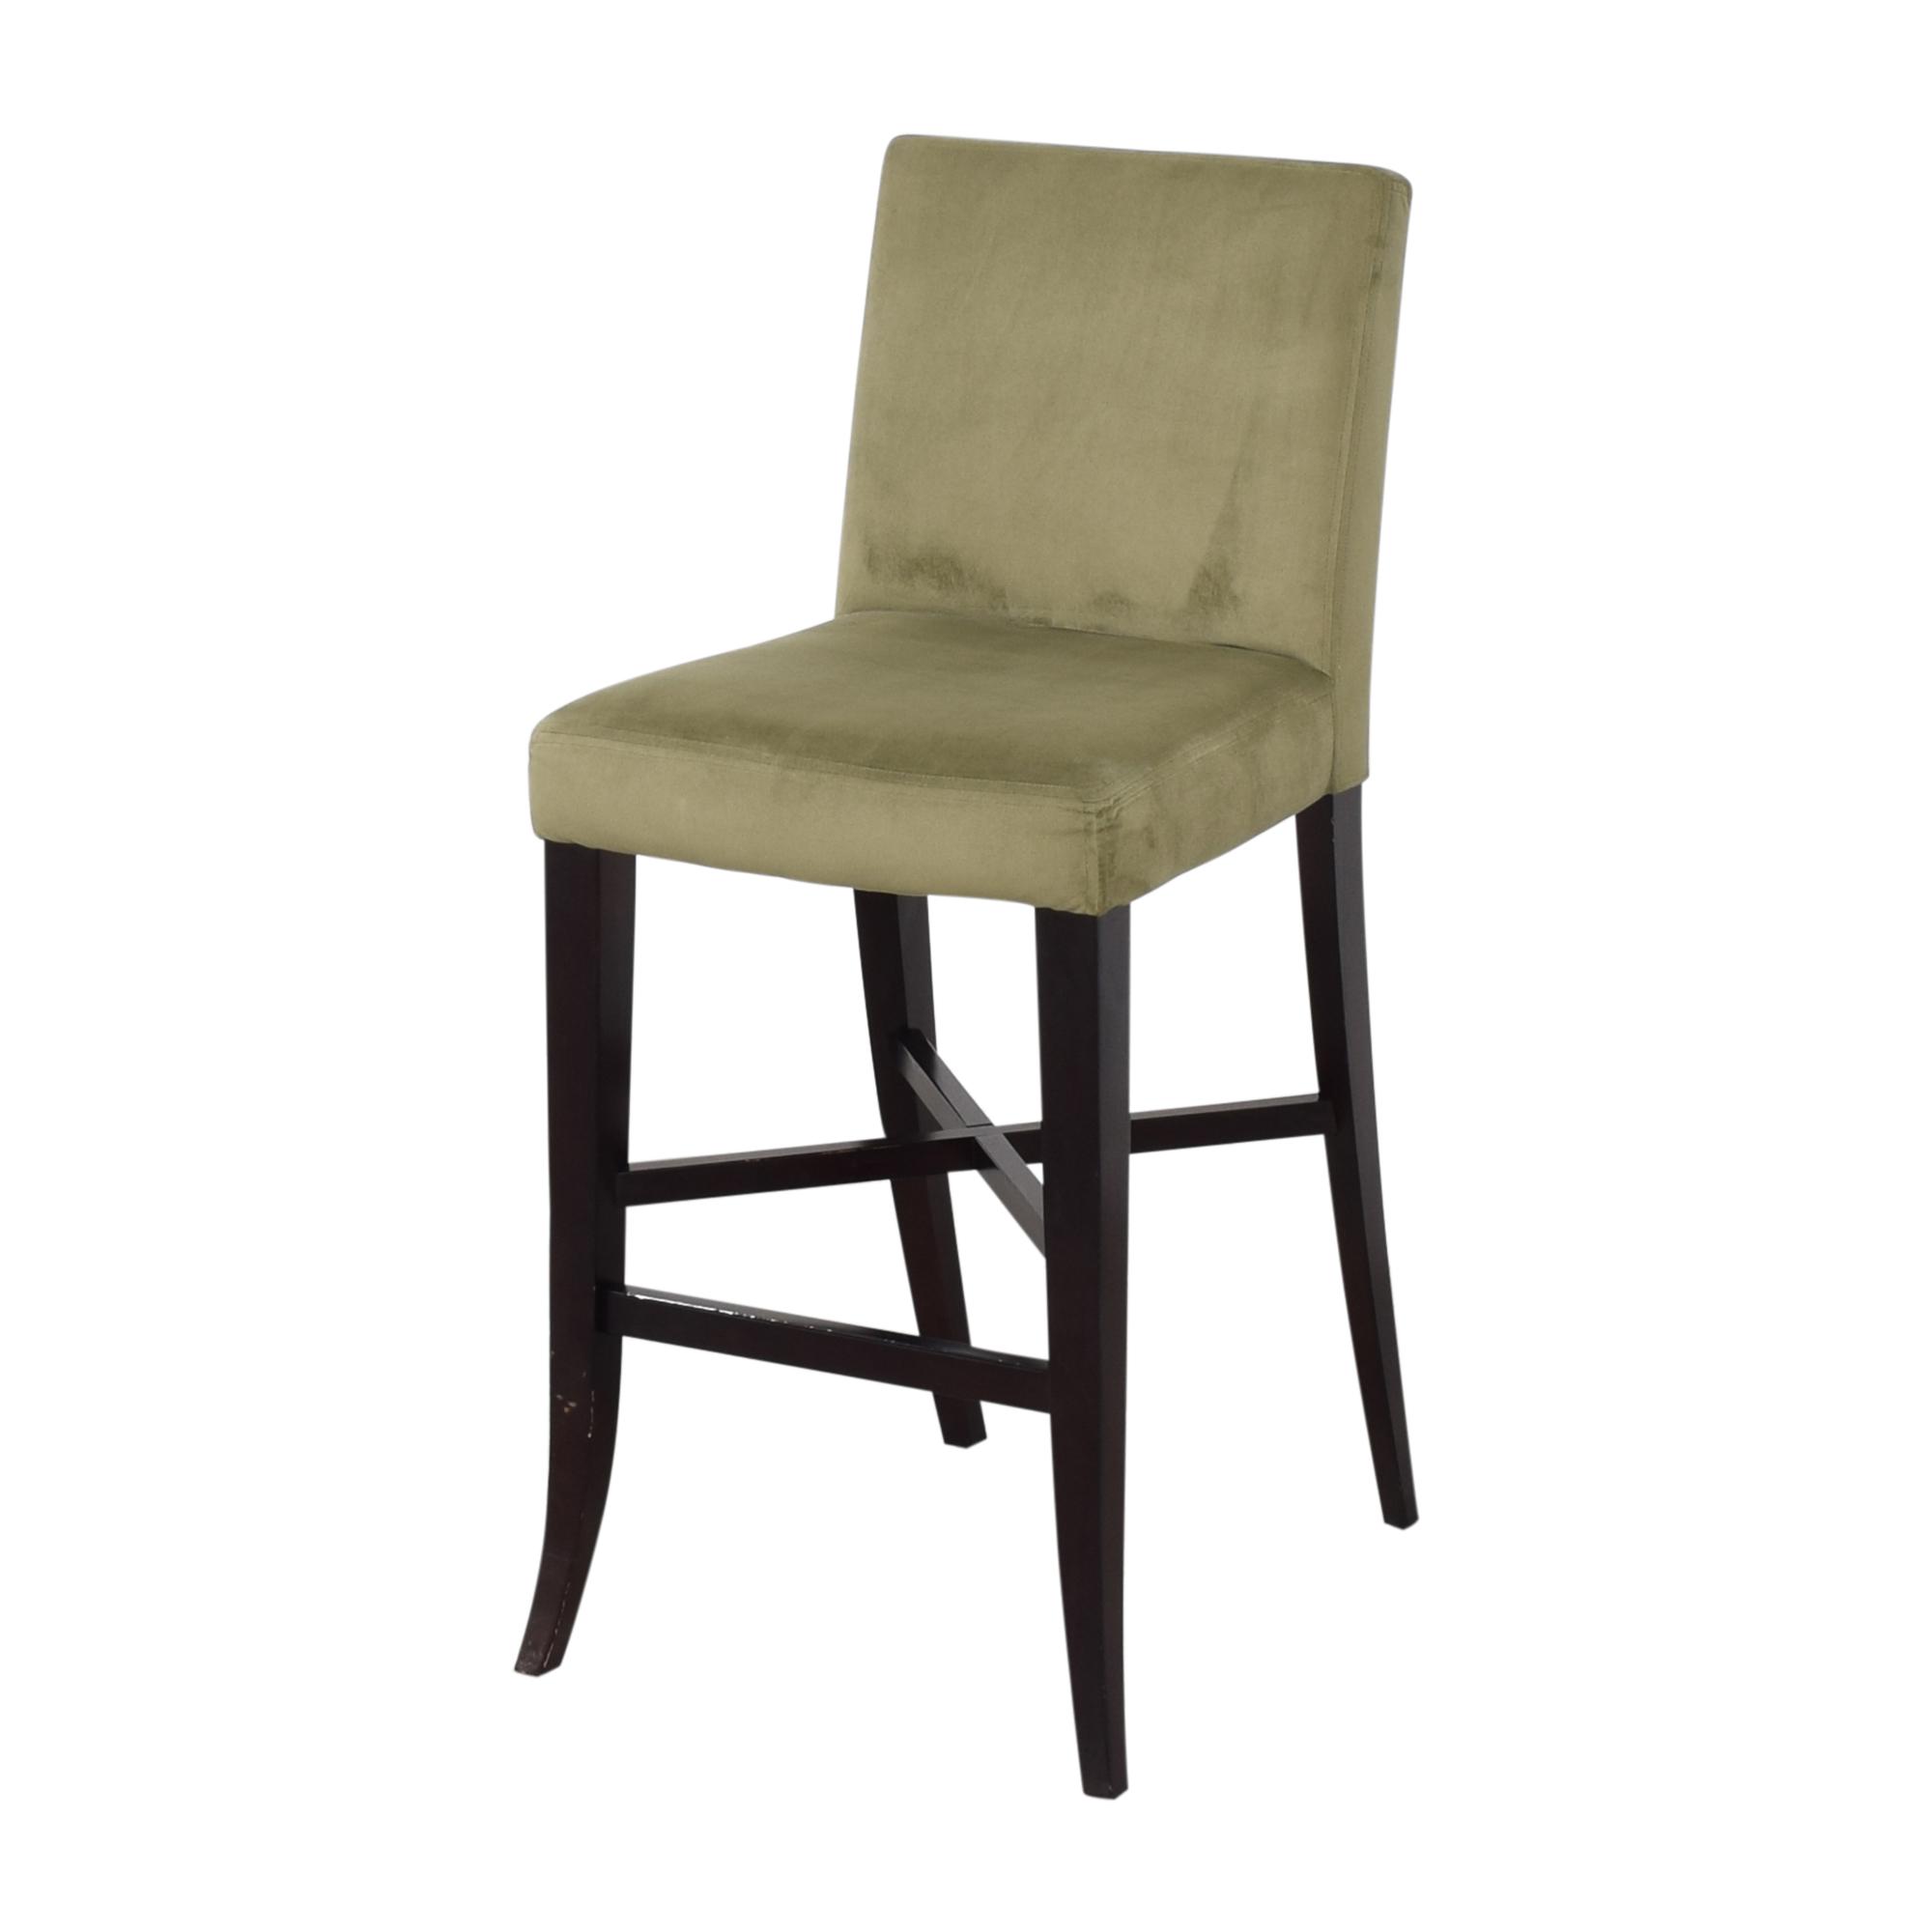 Crate & Barrel Upholstered Bar Stools / Stools